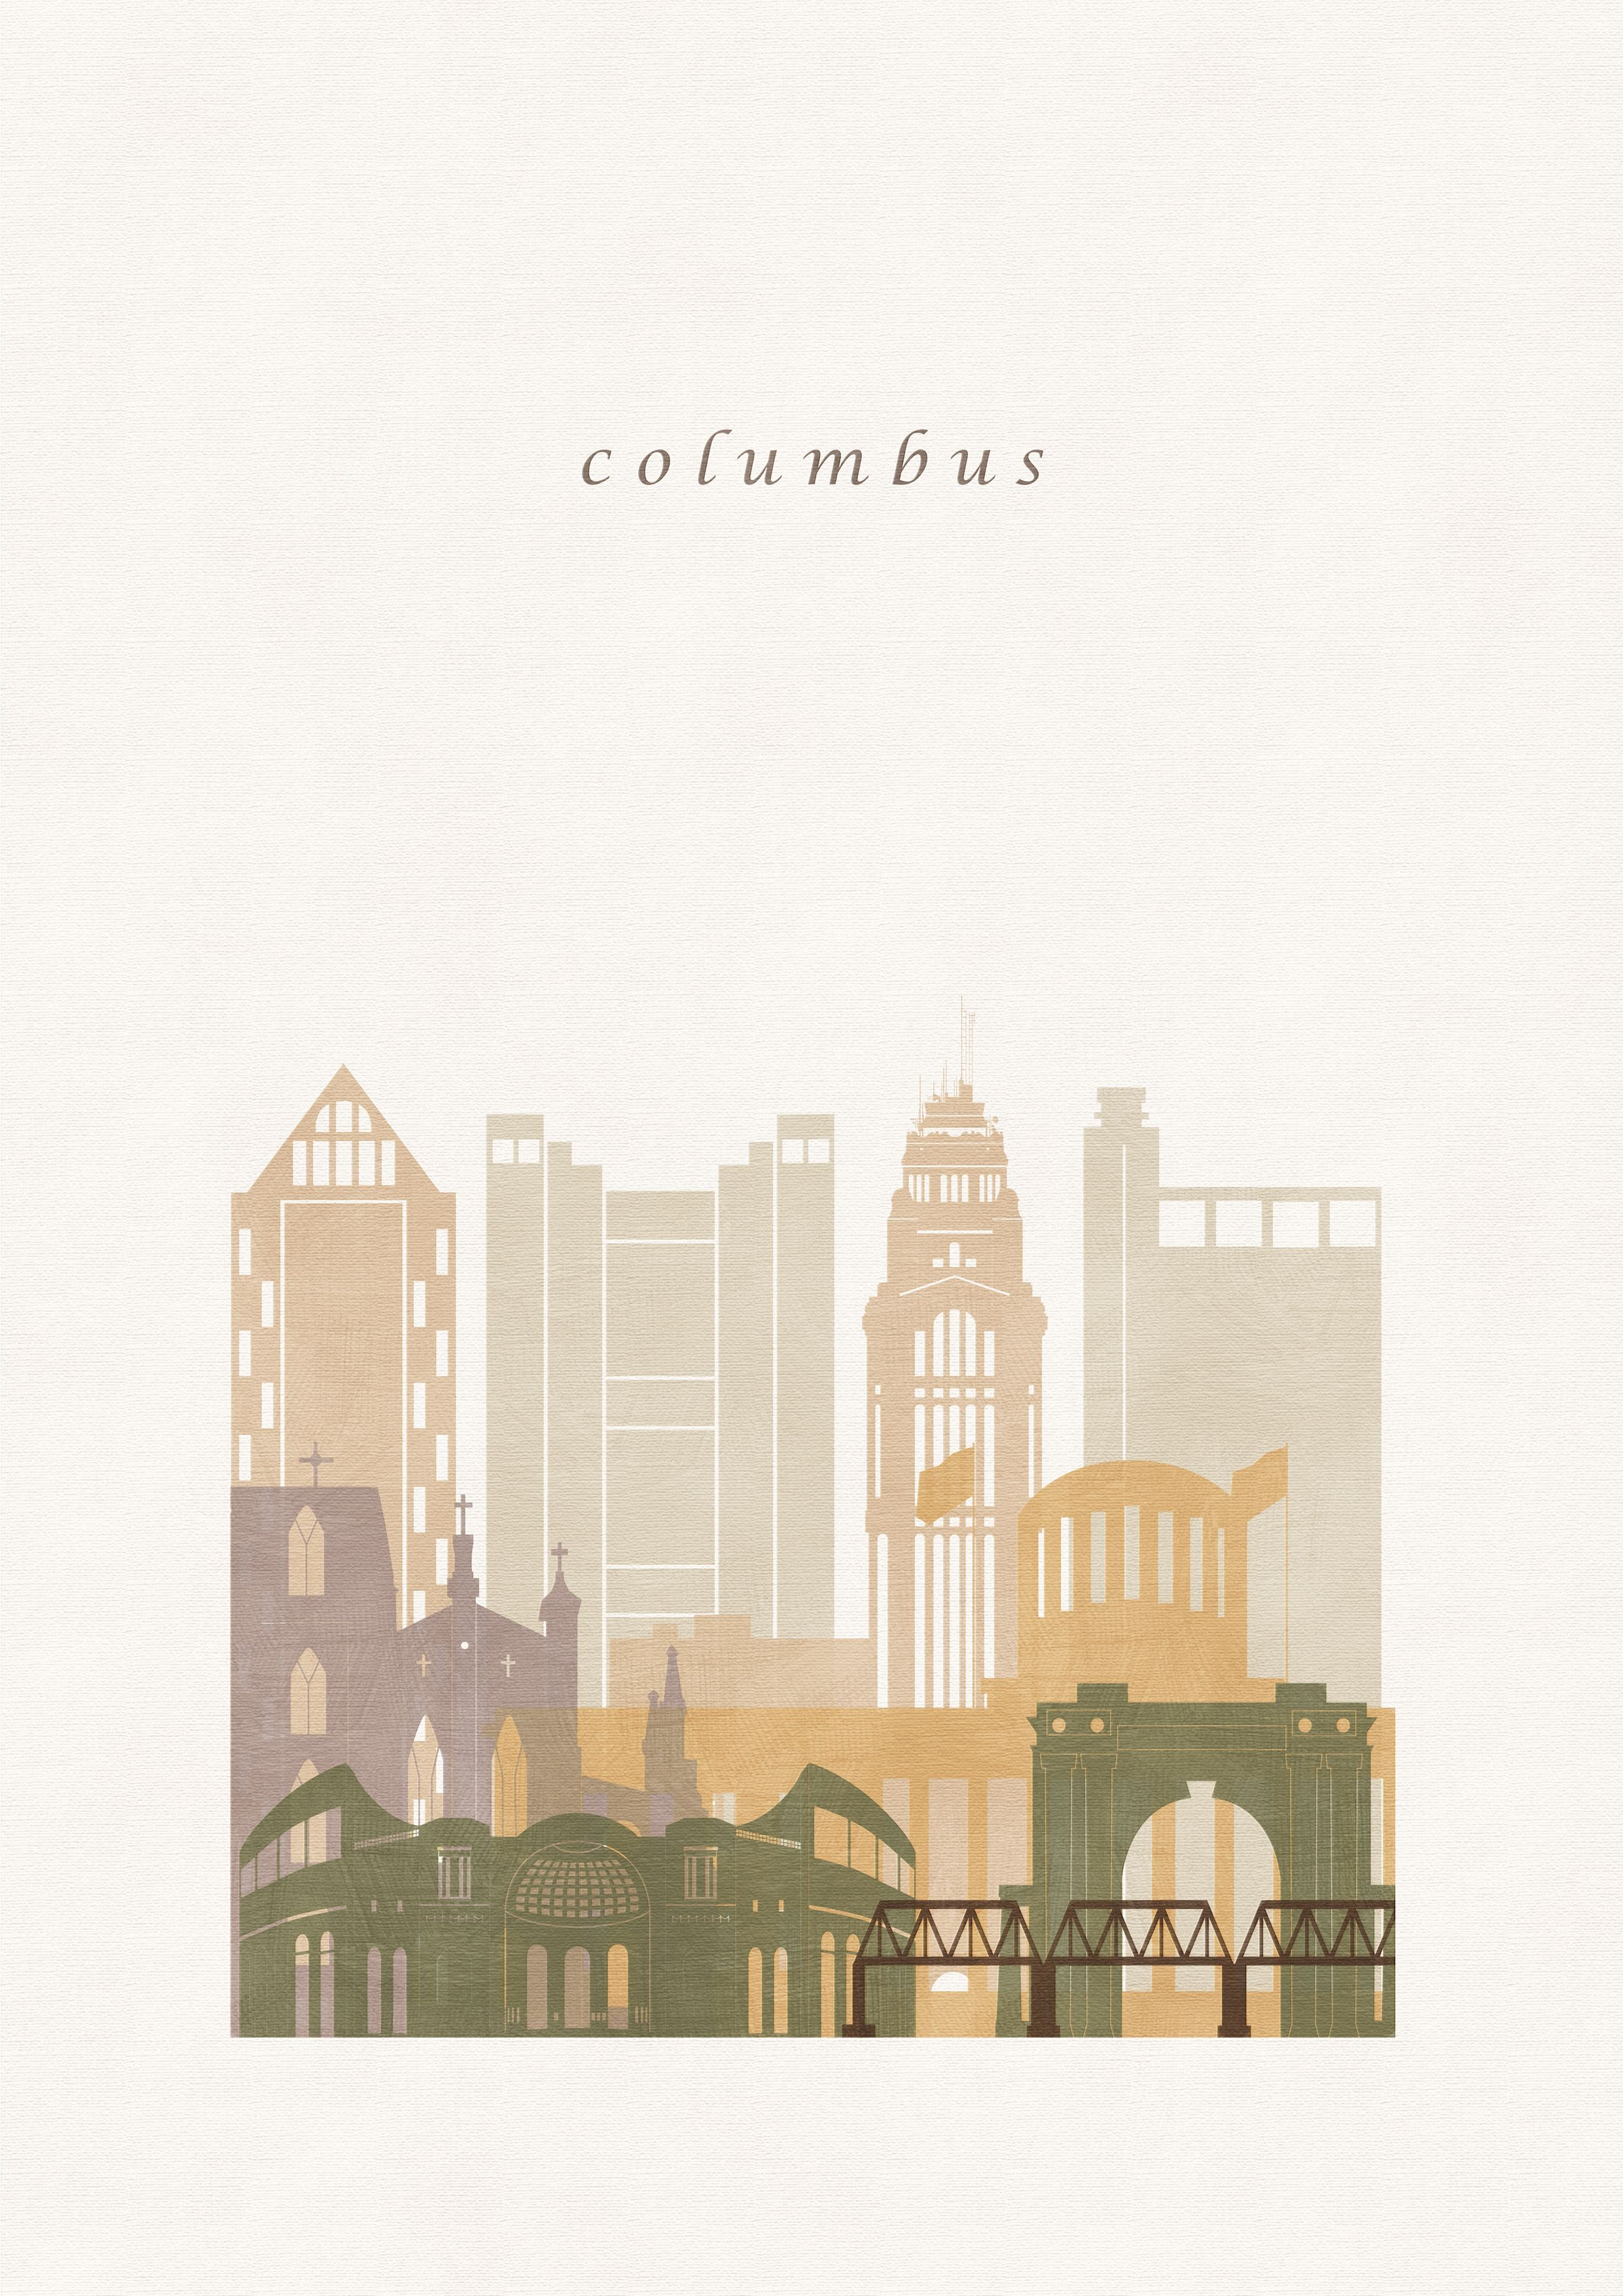 Columbus Illustration Printable Oh Travel Wall Art Prints Etsy Travel Wall Art Wall Art Prints City Prints